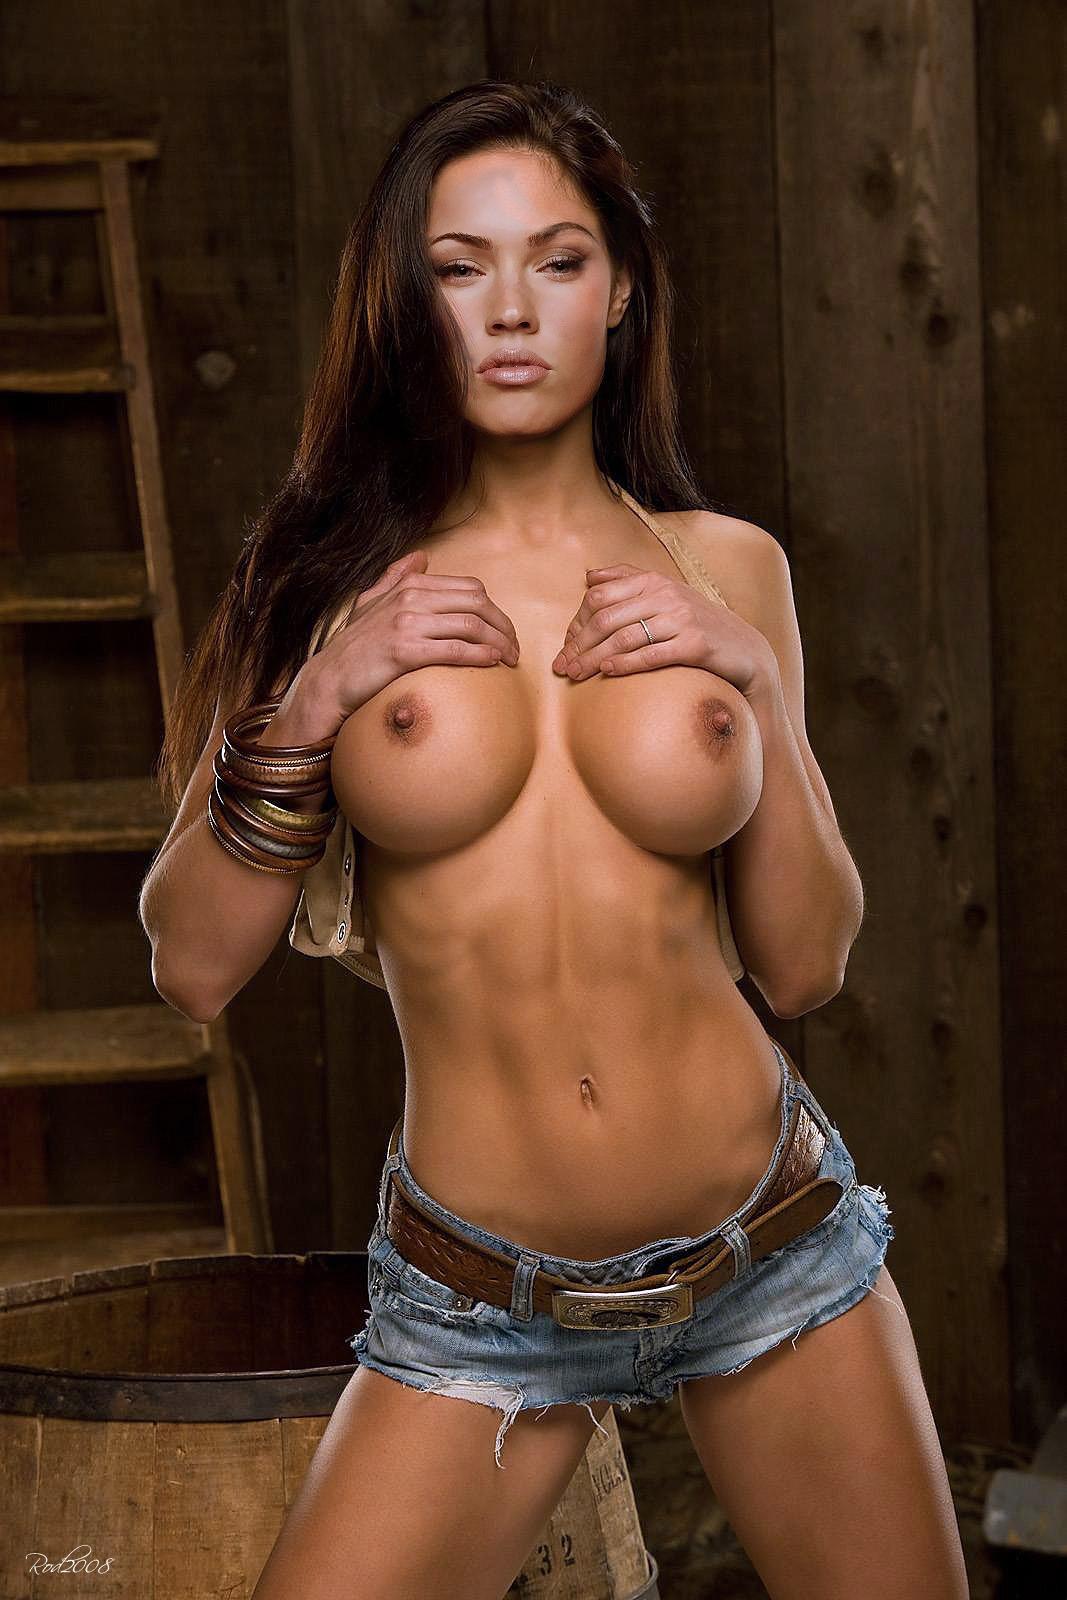 sexy big boobs porn and sexy nude big boobs pornstars photos